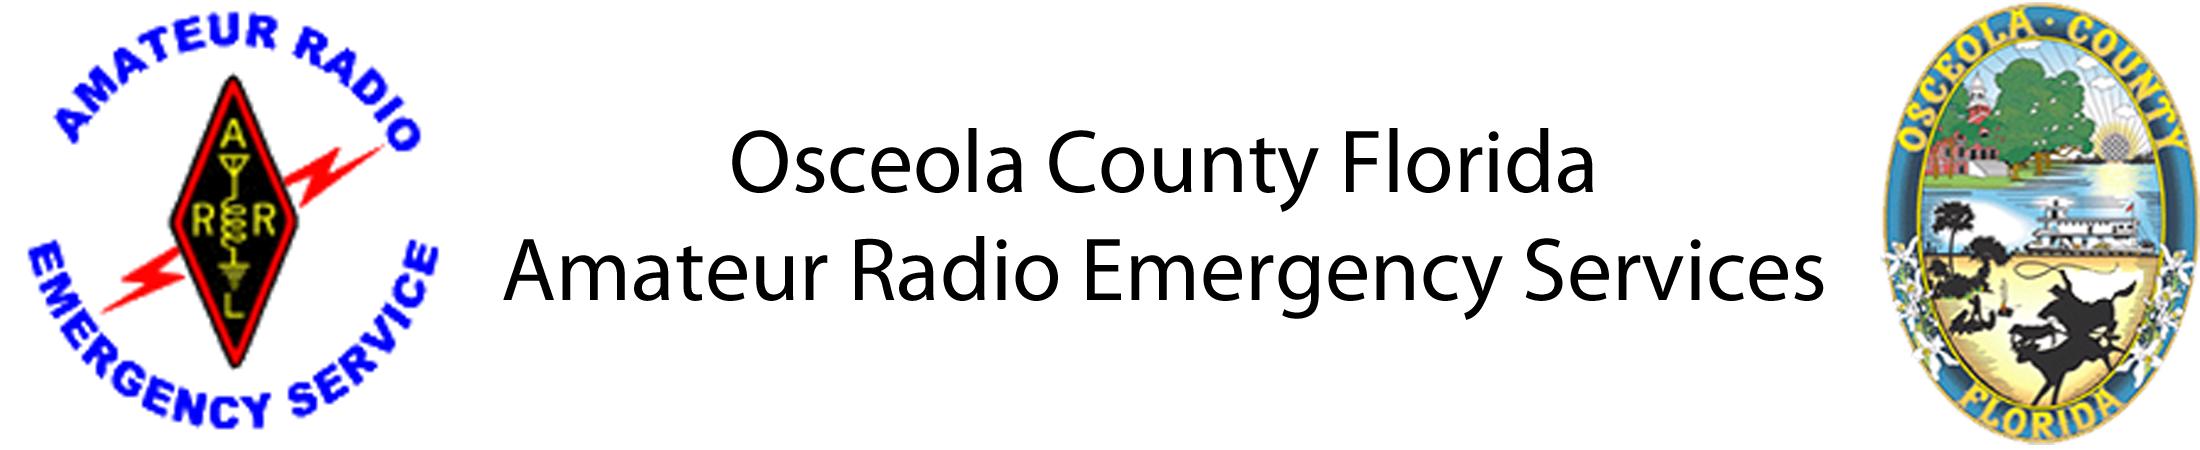 Osceola County Florida Amateur Radio Emergency Services